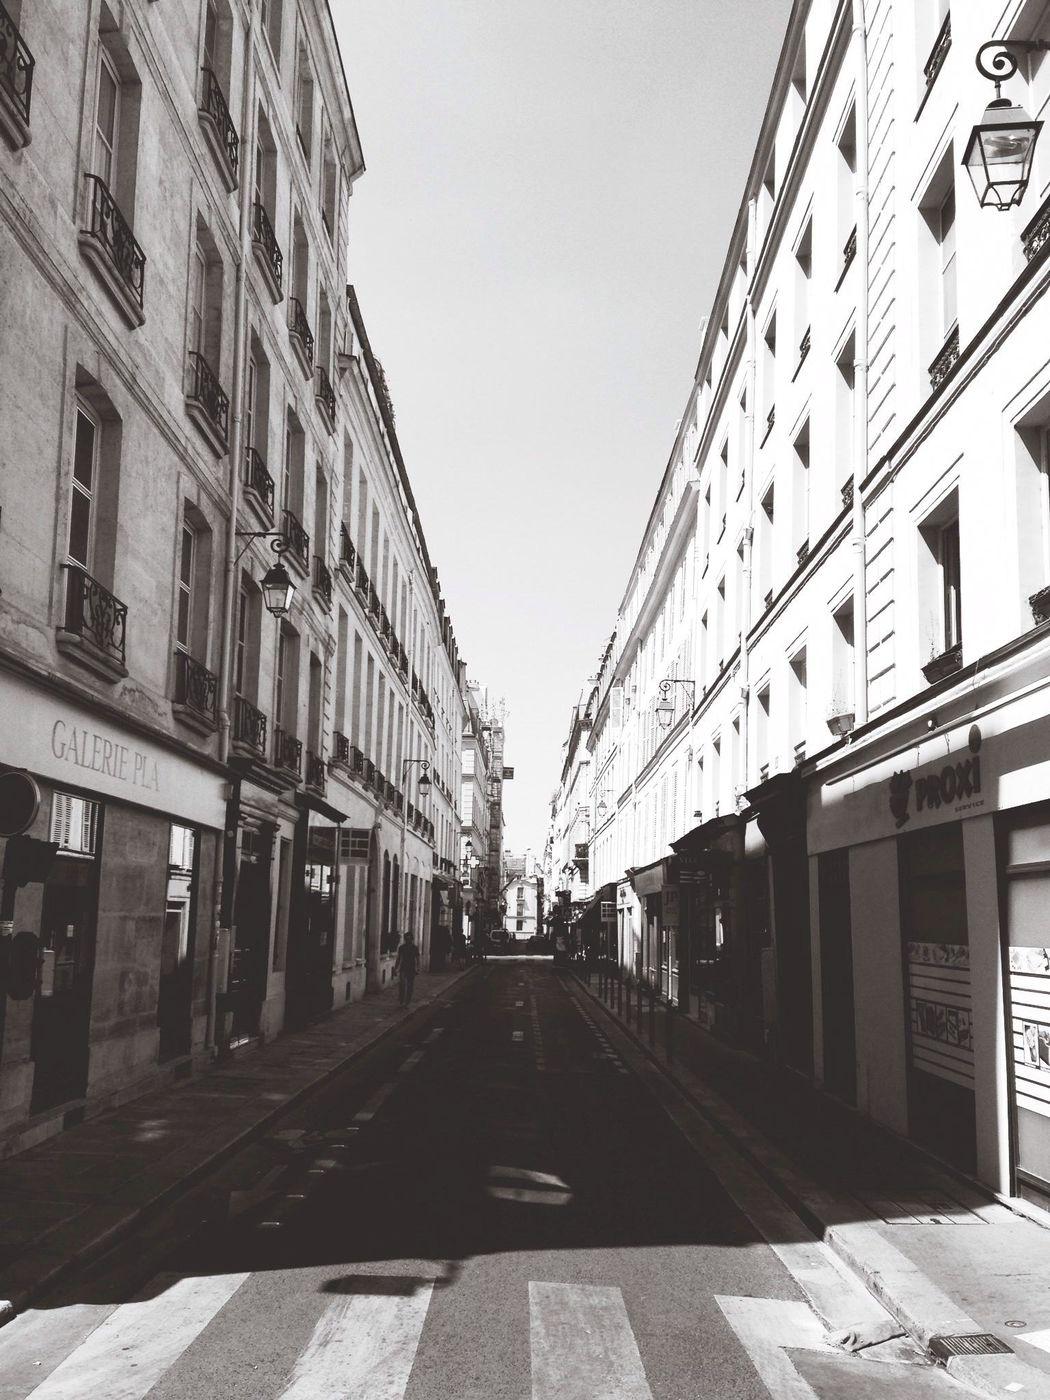 Bw_collection Streetphoto_bw Blackandwhite EyeEm Best Shots - Black + White